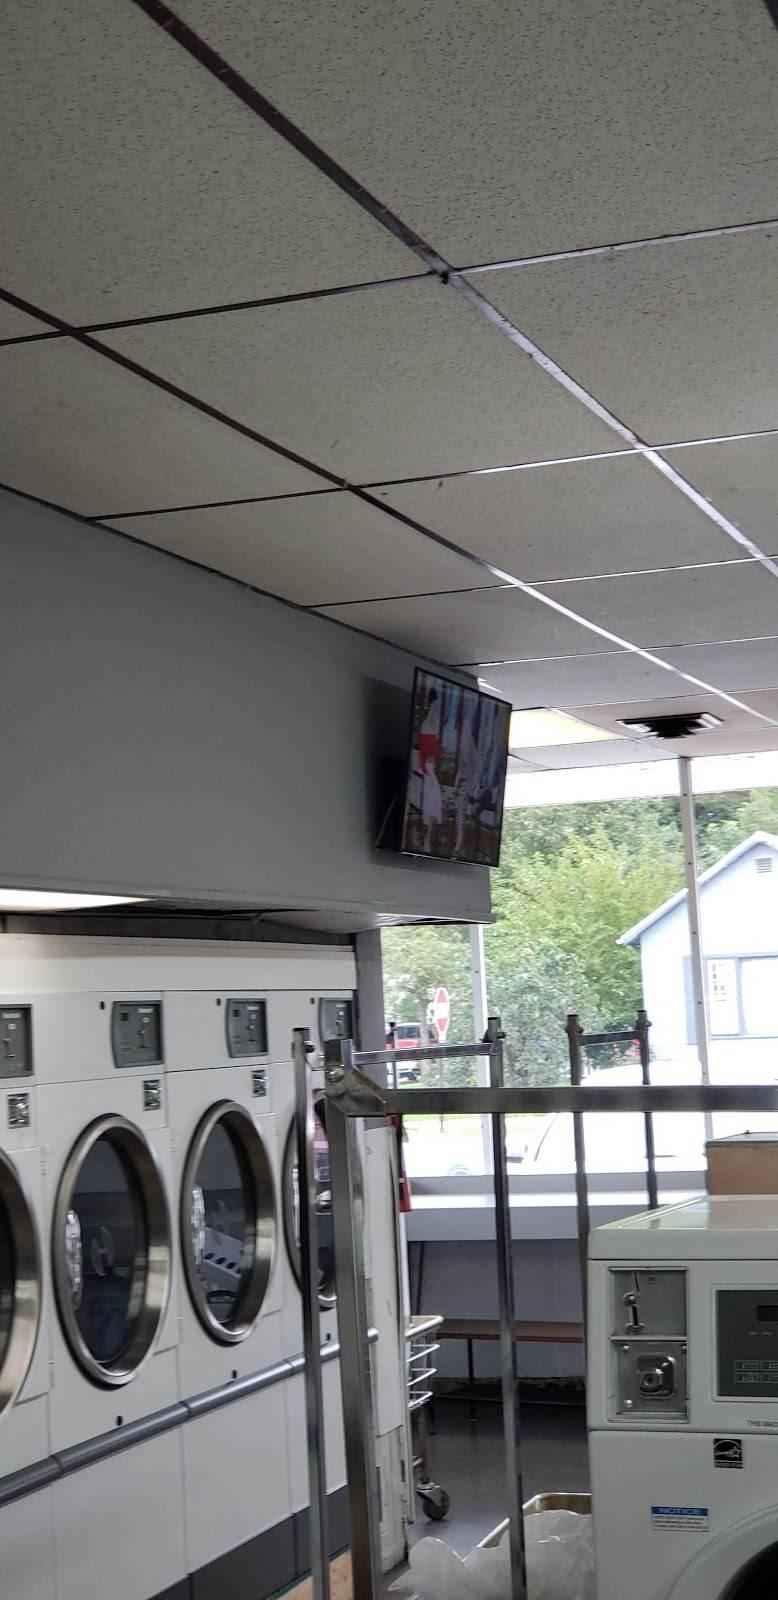 Maumee Laundry - laundry  | Photo 7 of 9 | Address: 122 E Indiana Ave, Maumee, OH 43537, USA | Phone: (419) 893-6351